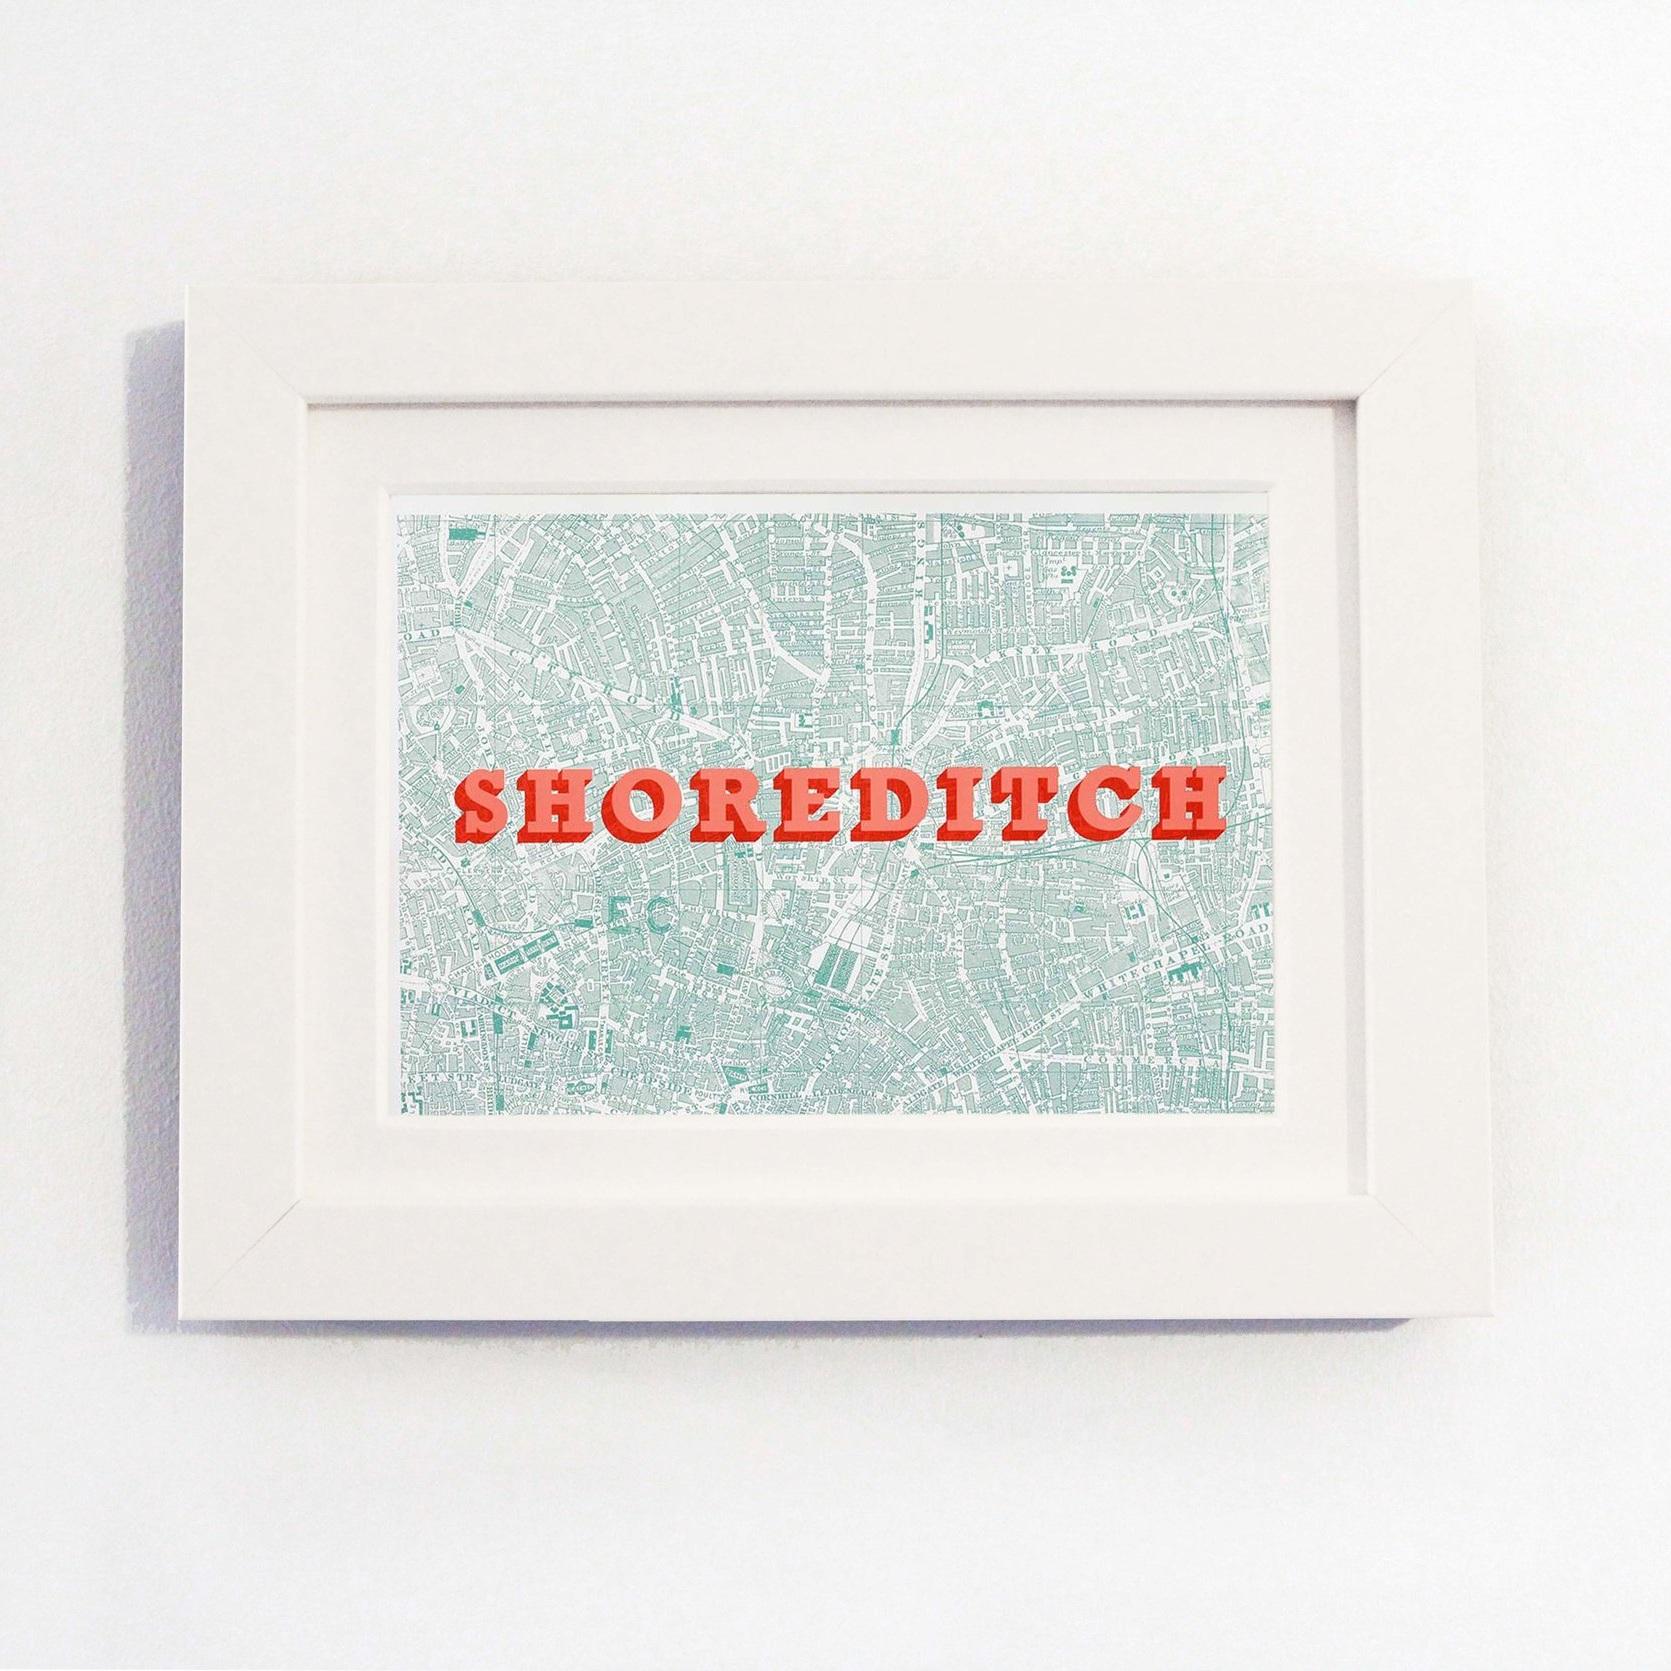 shoreditch+white+frame.jpg